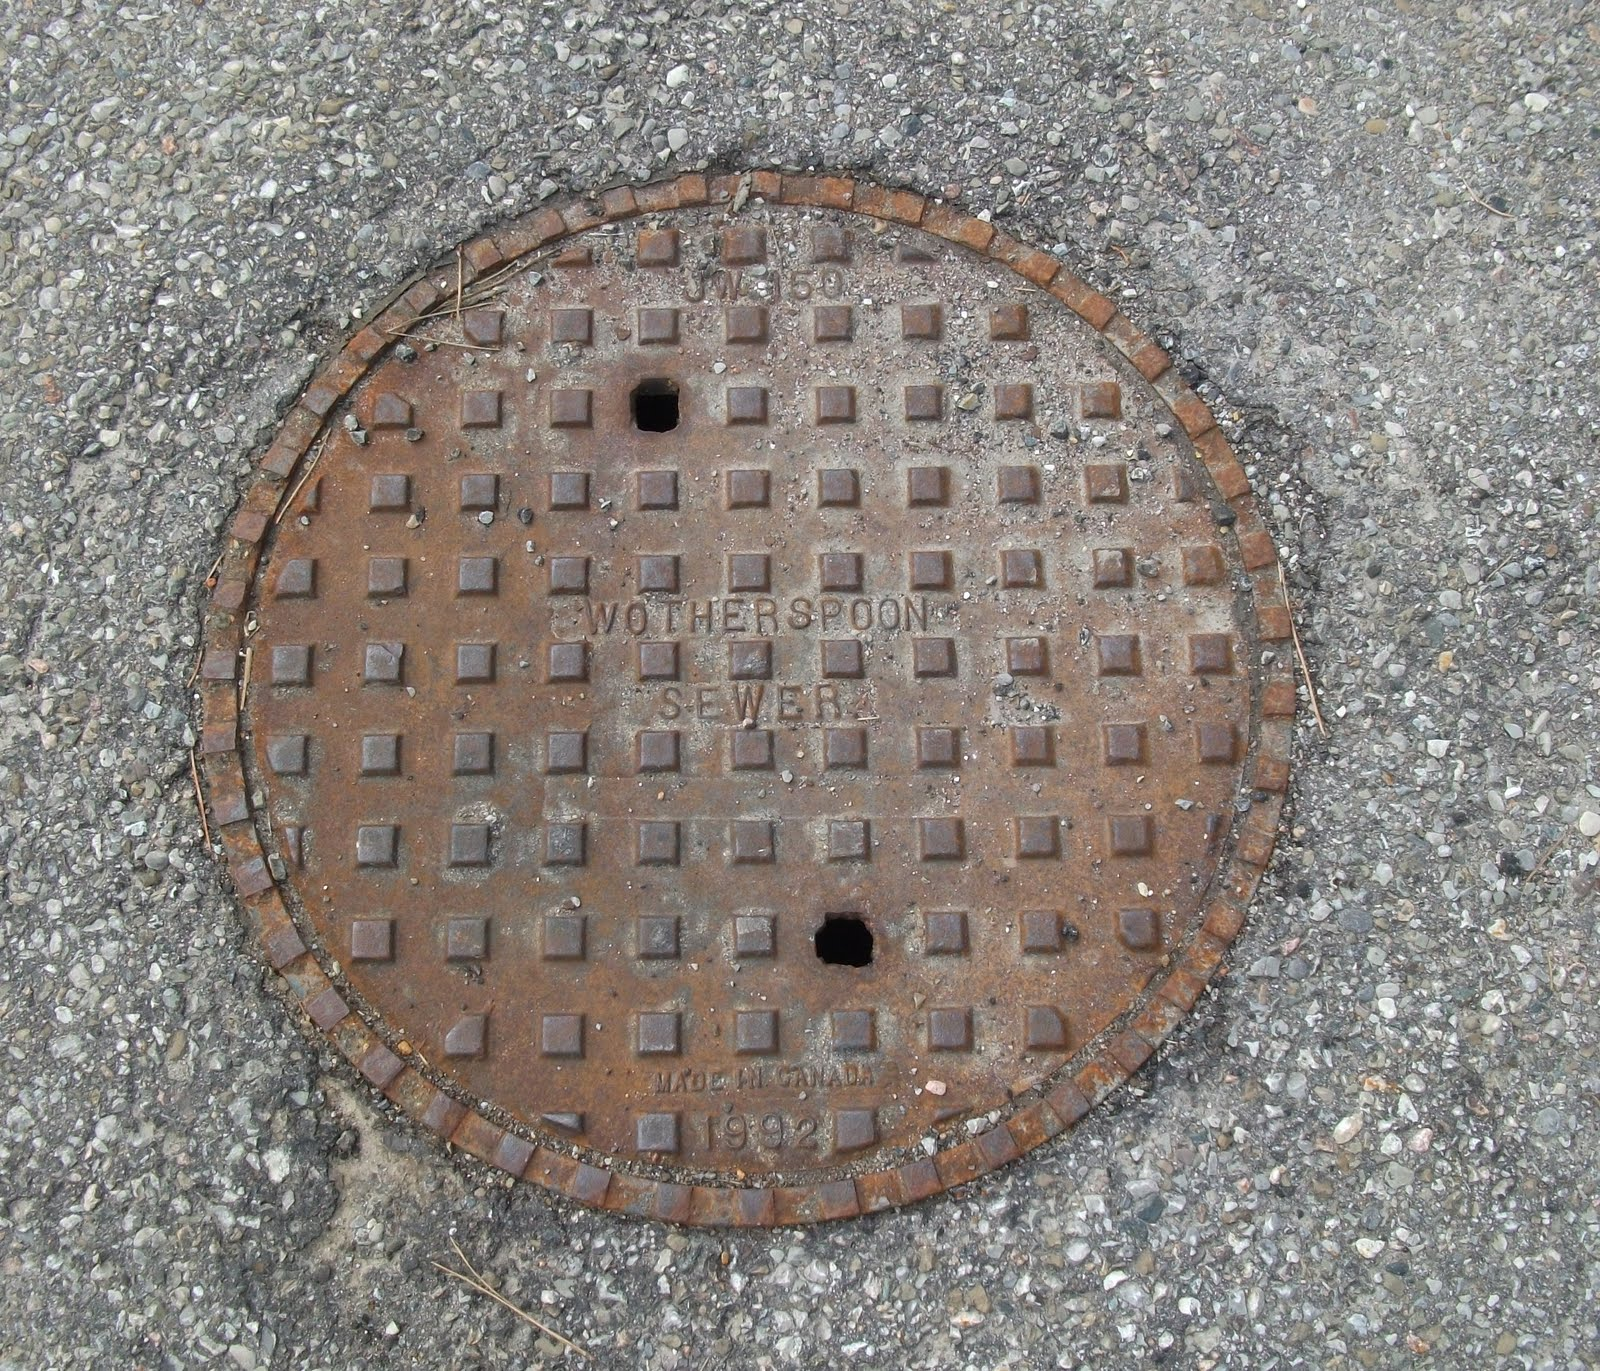 Random Thoughts Manhole Covers